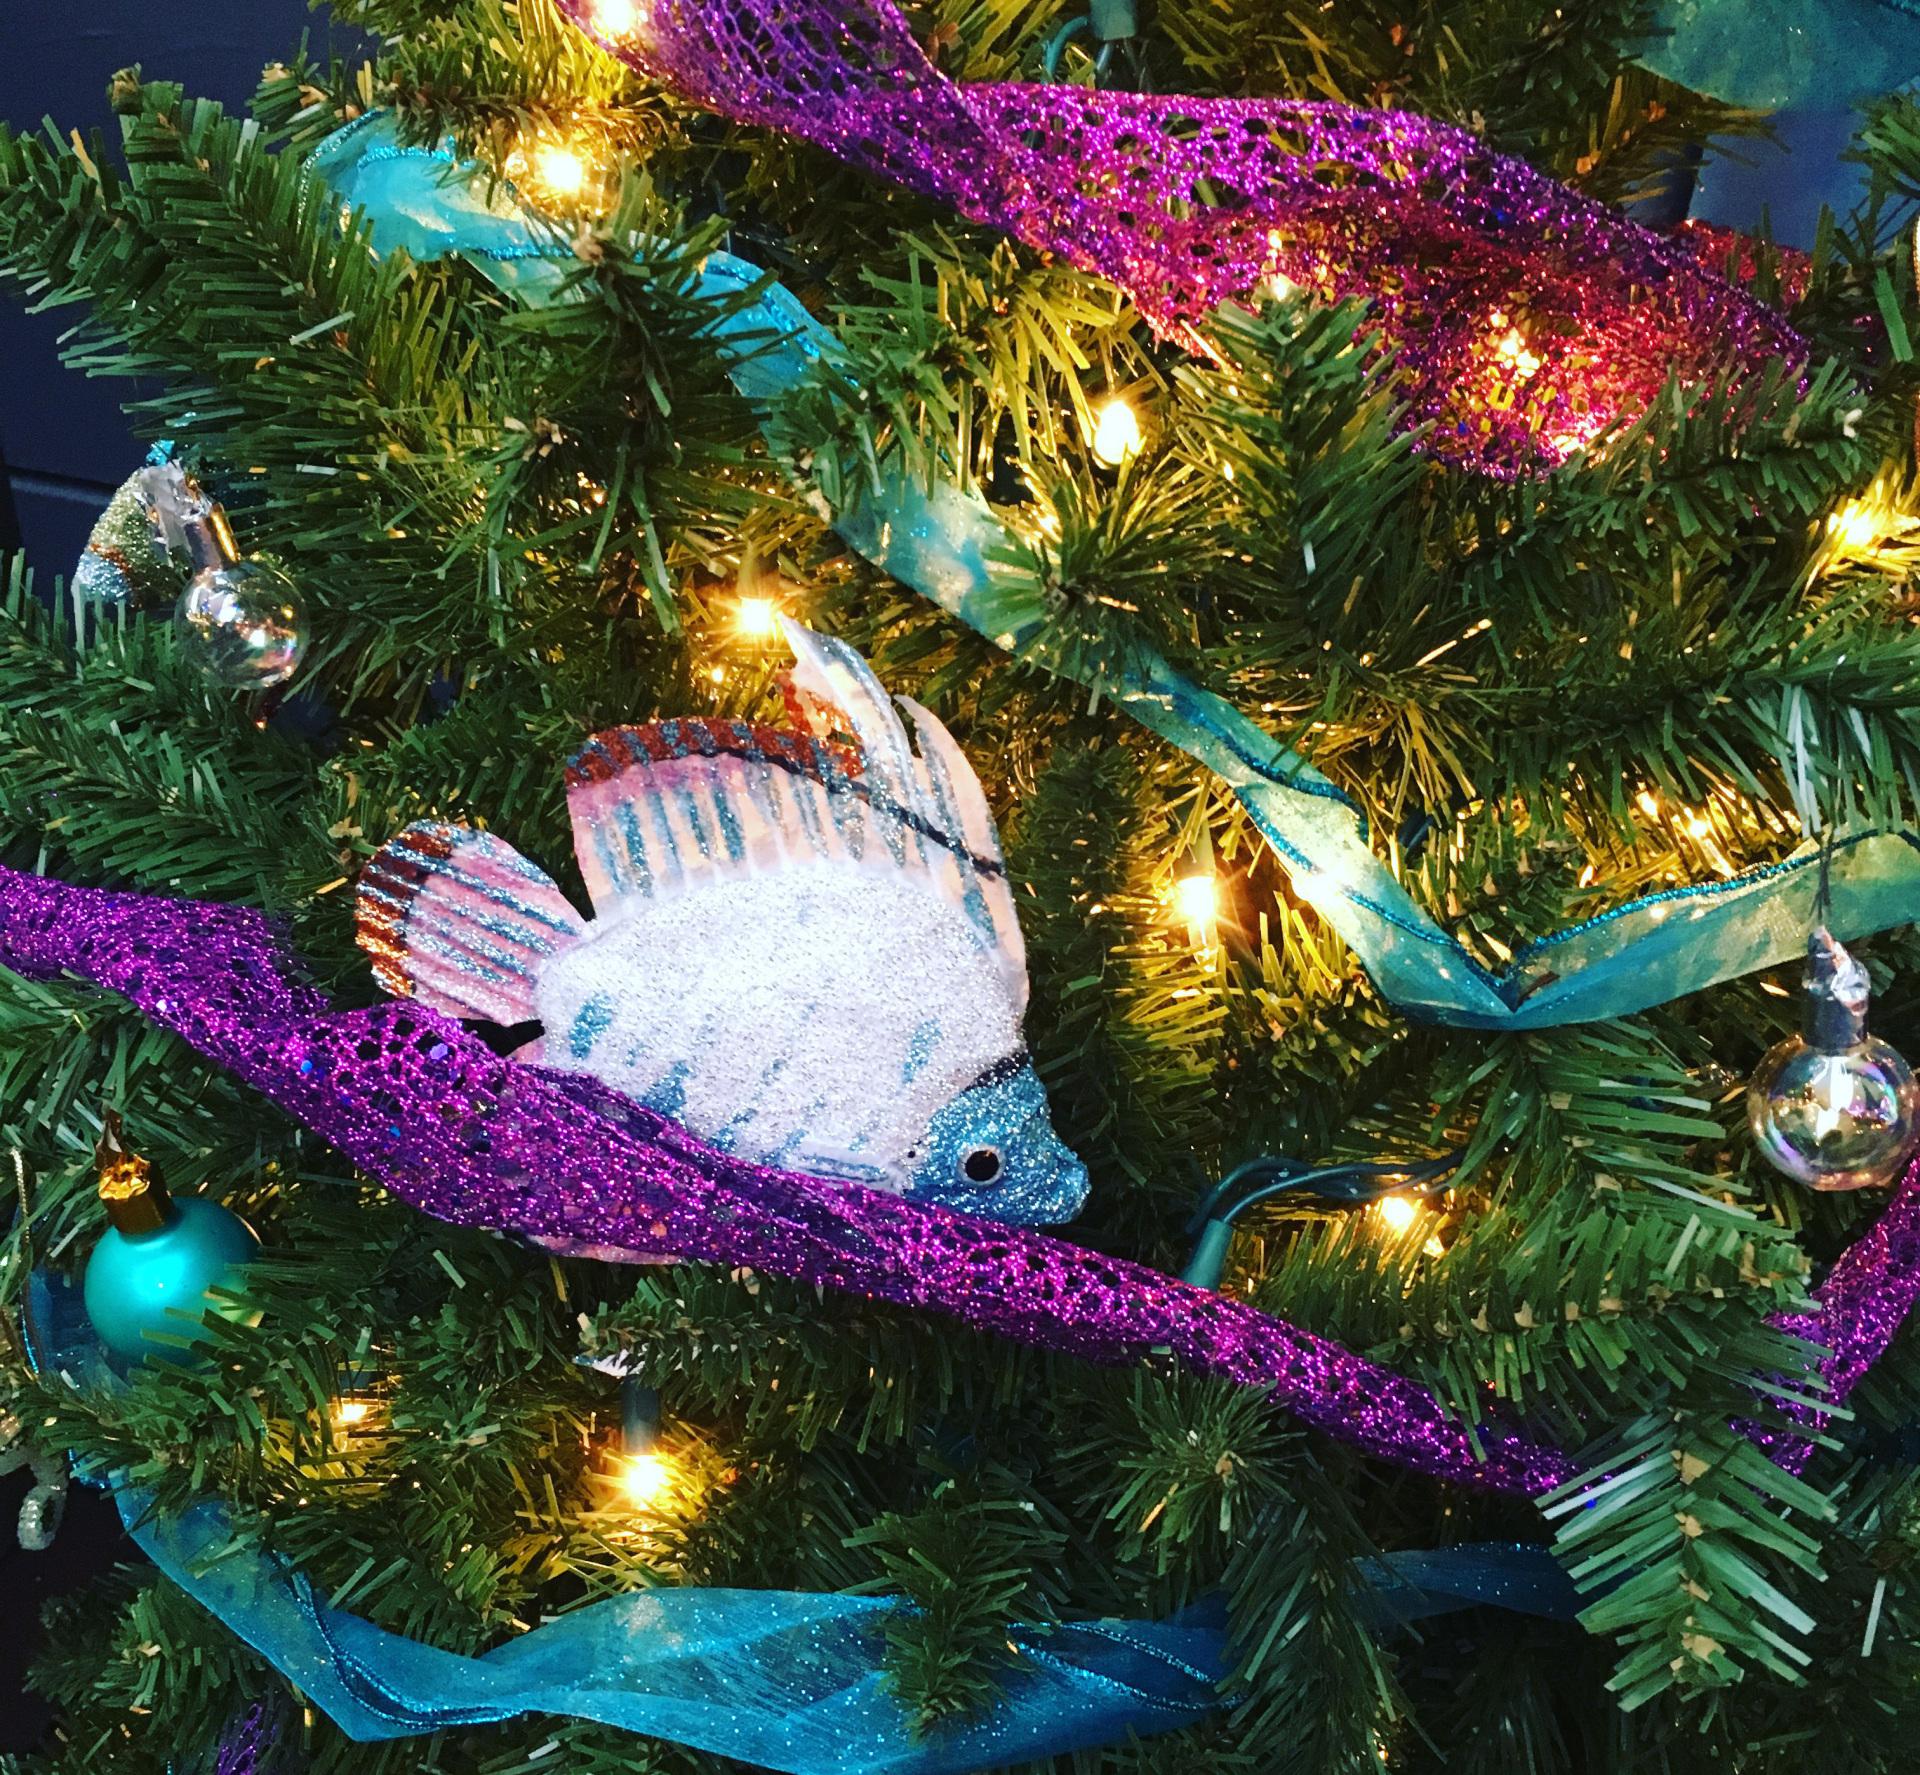 Happy Holidays from Milla Agai Photography